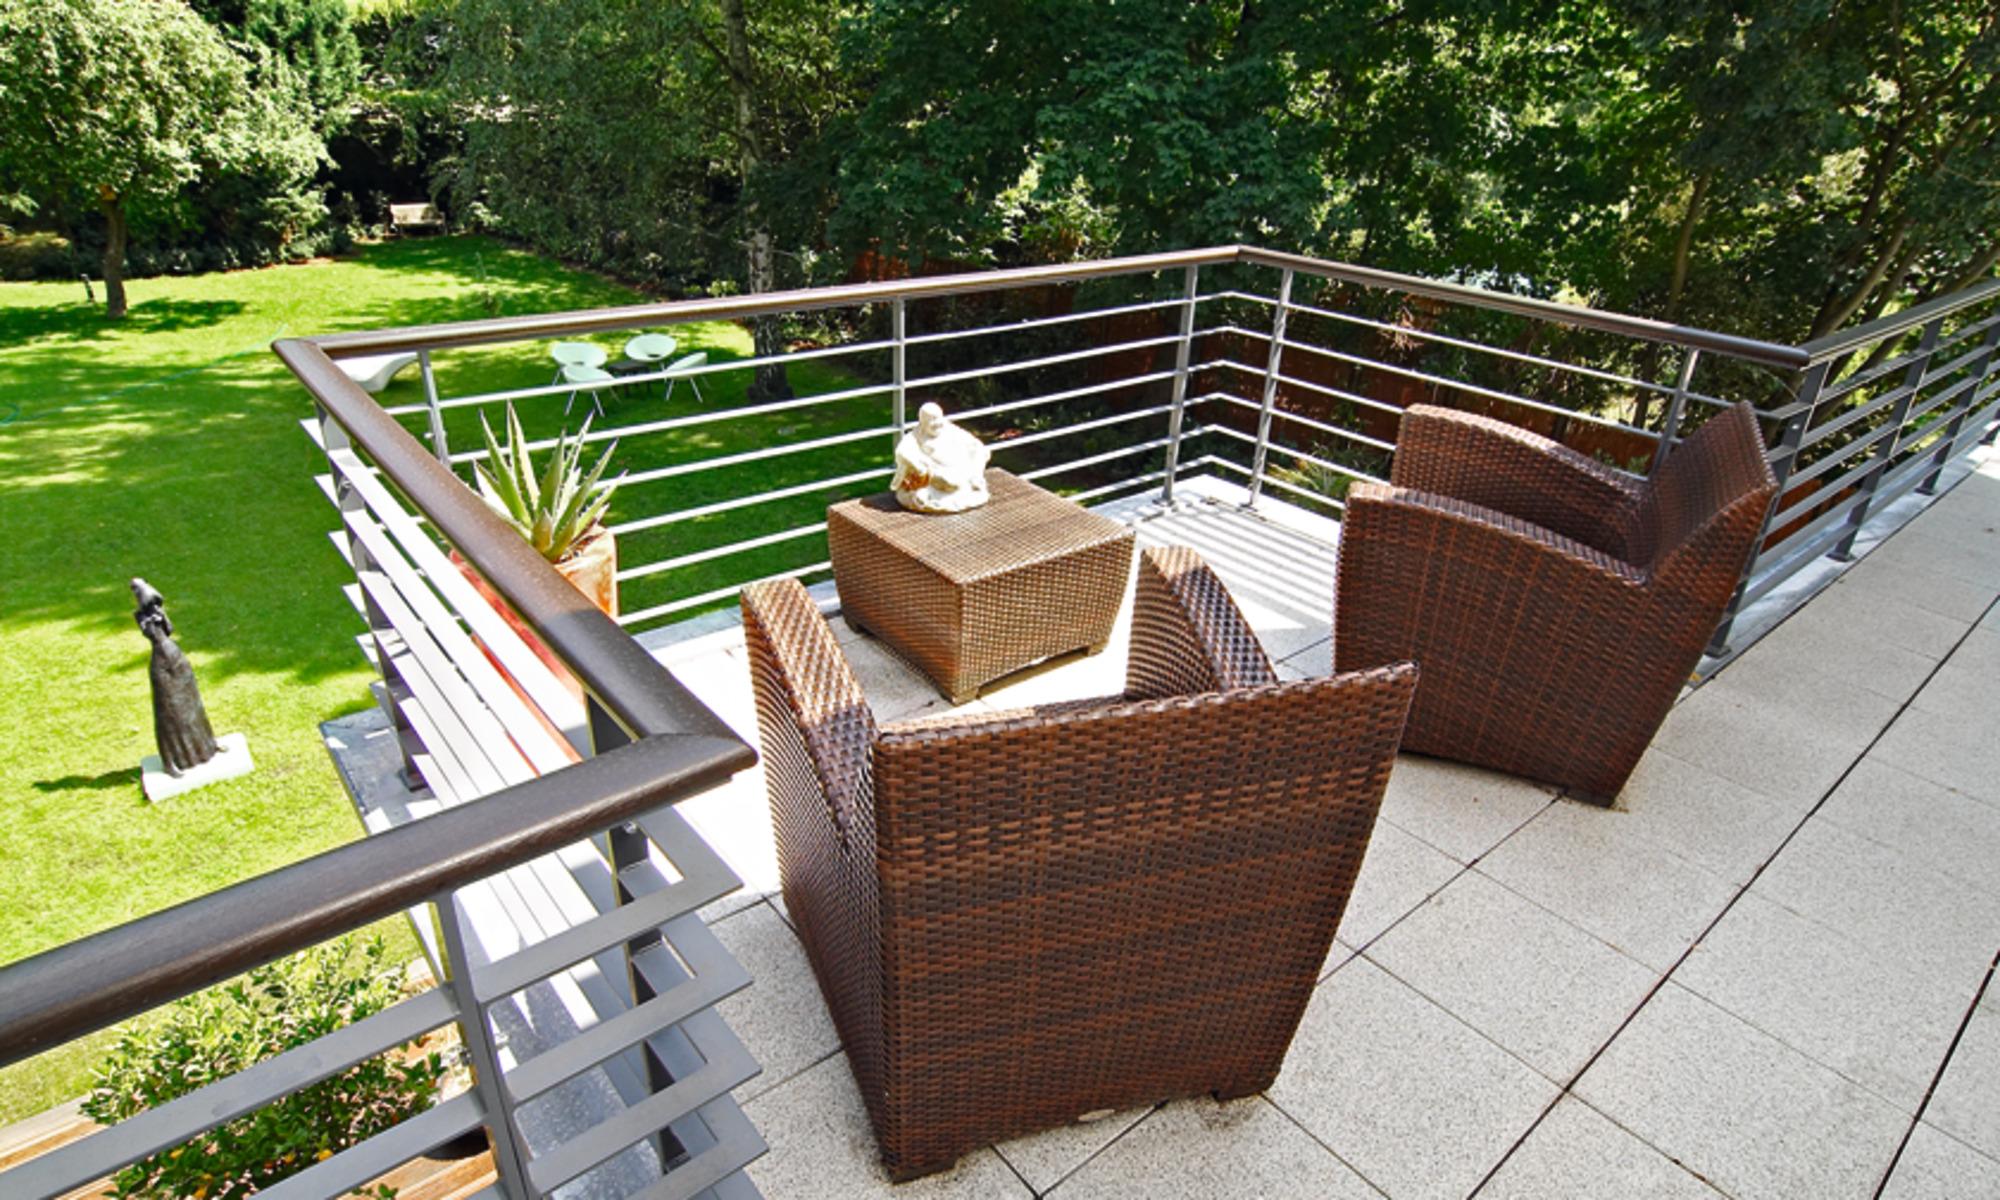 Energy-efficient wooden prefab home